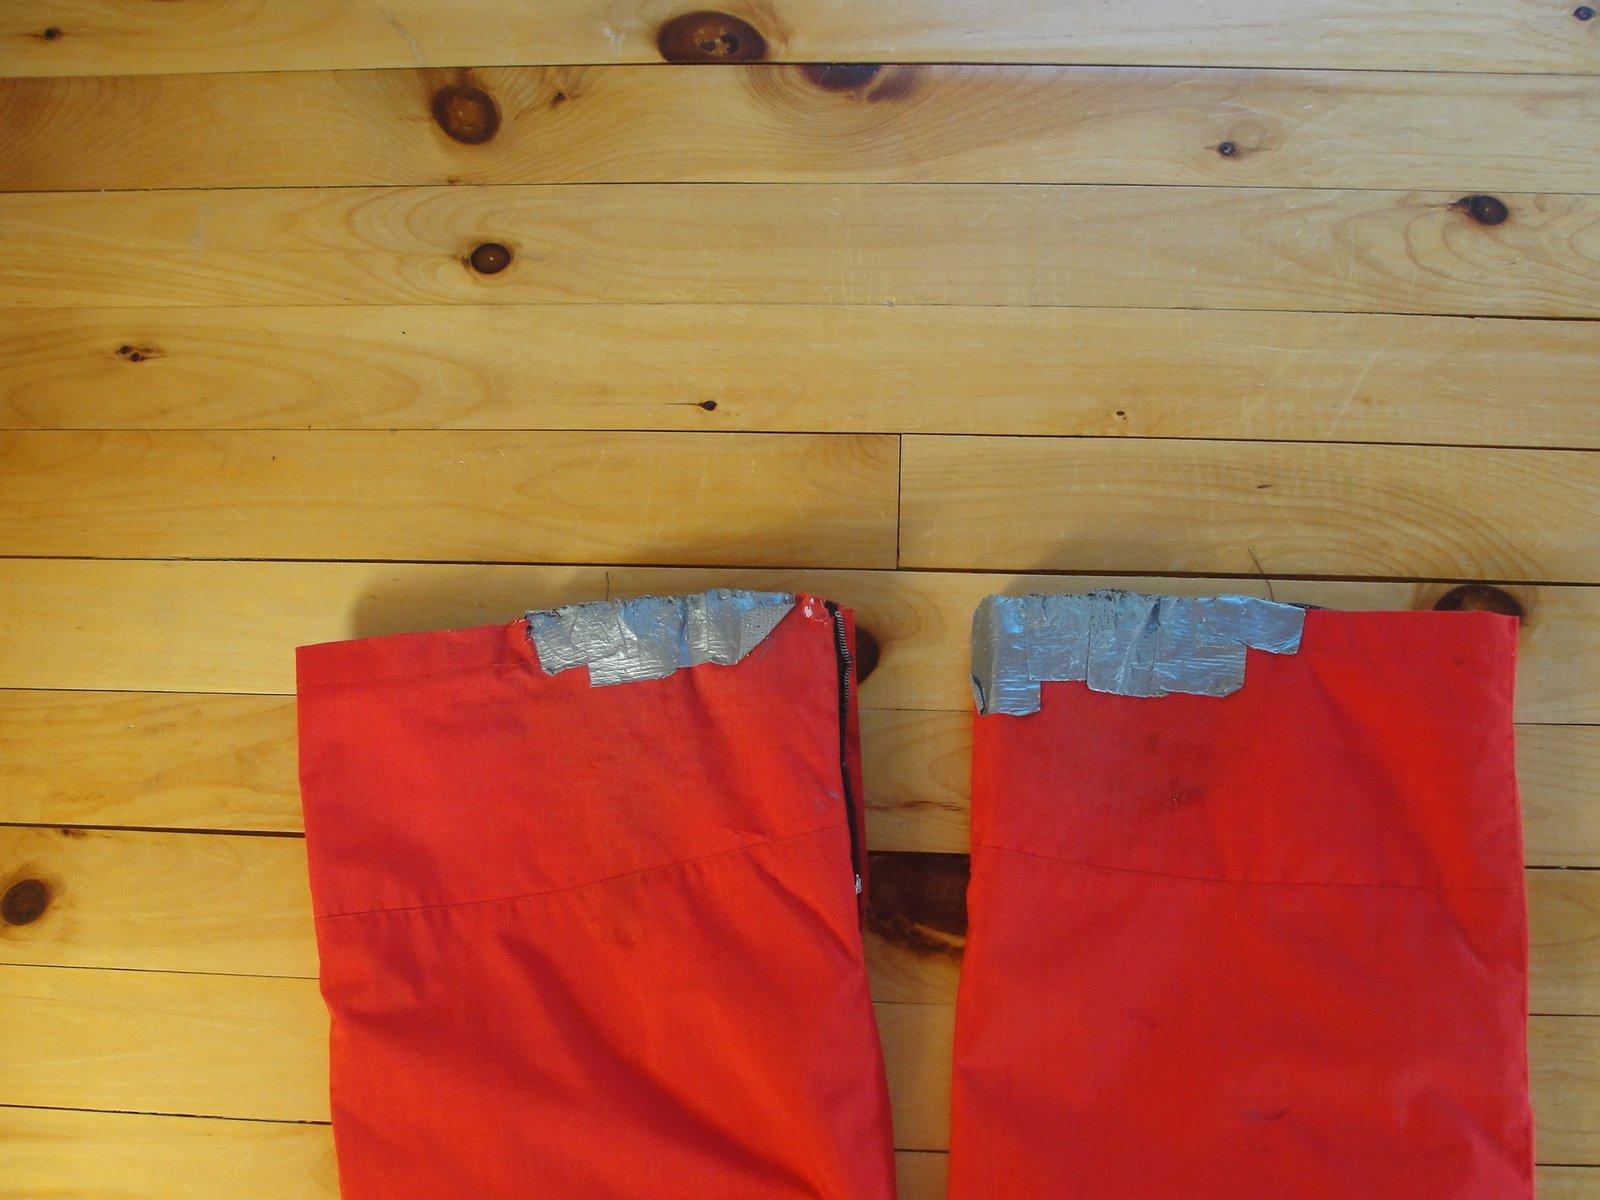 DC Fire Pants For Sale